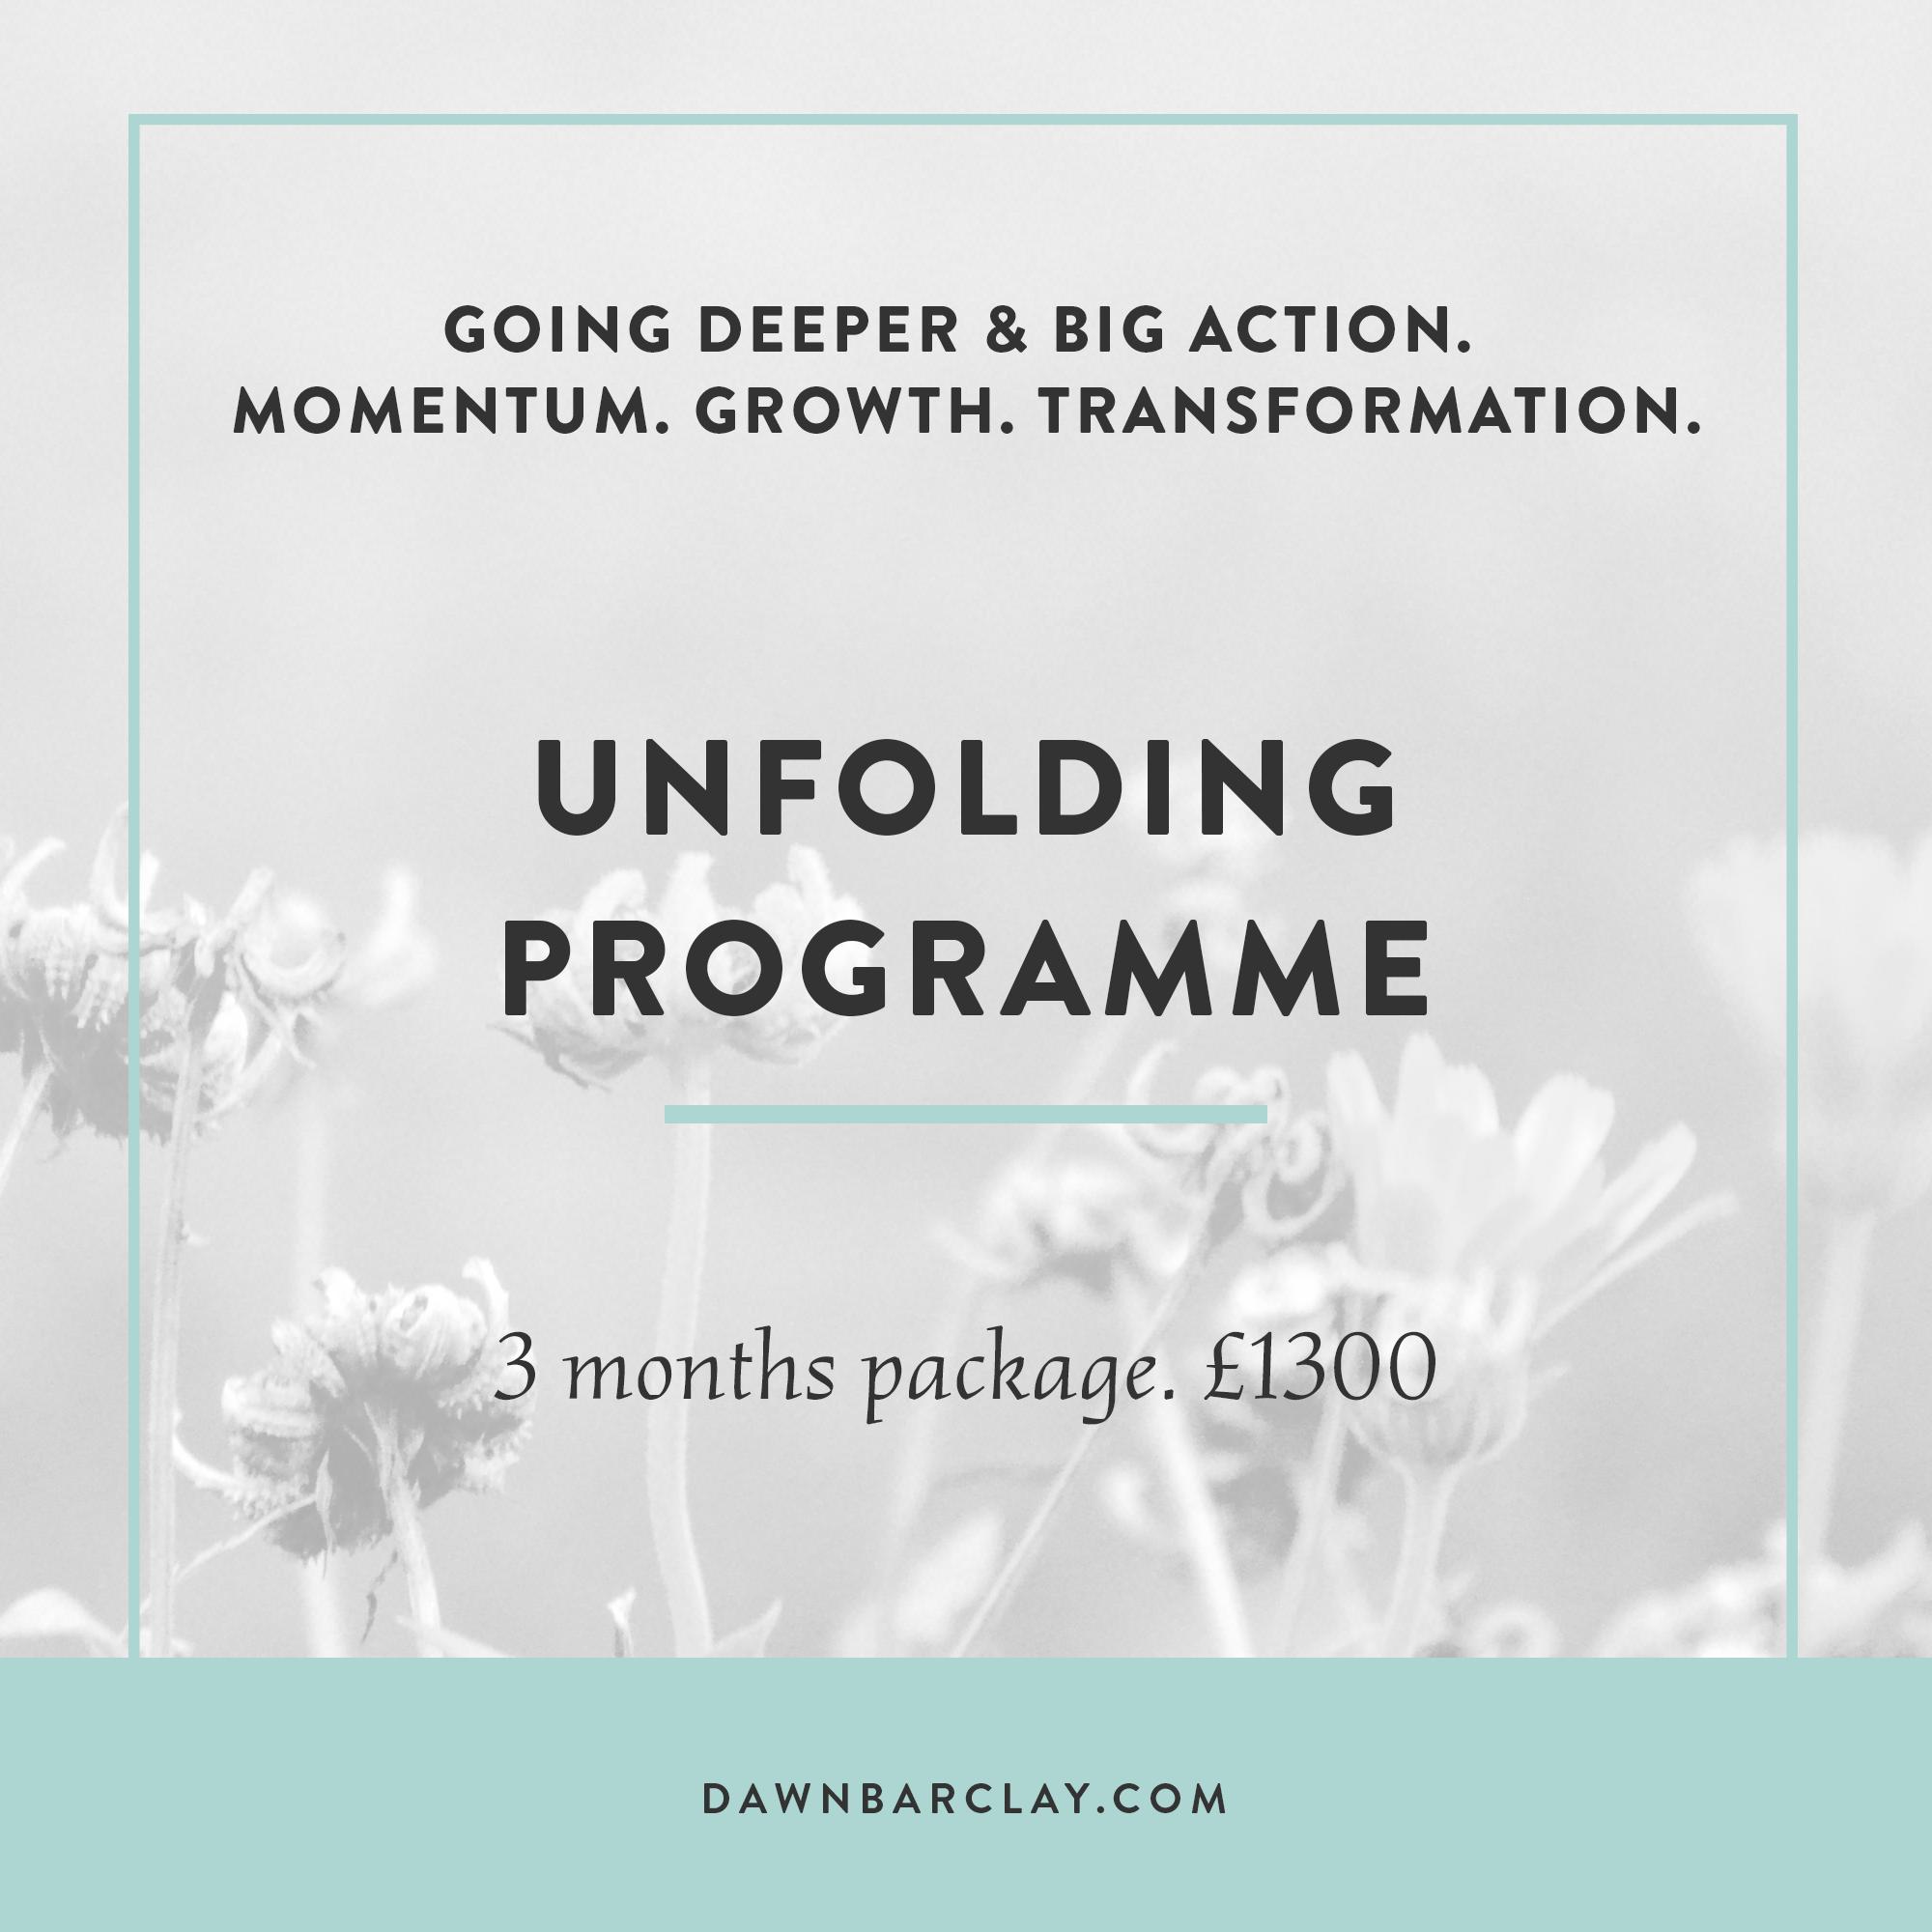 Unfolding Programme